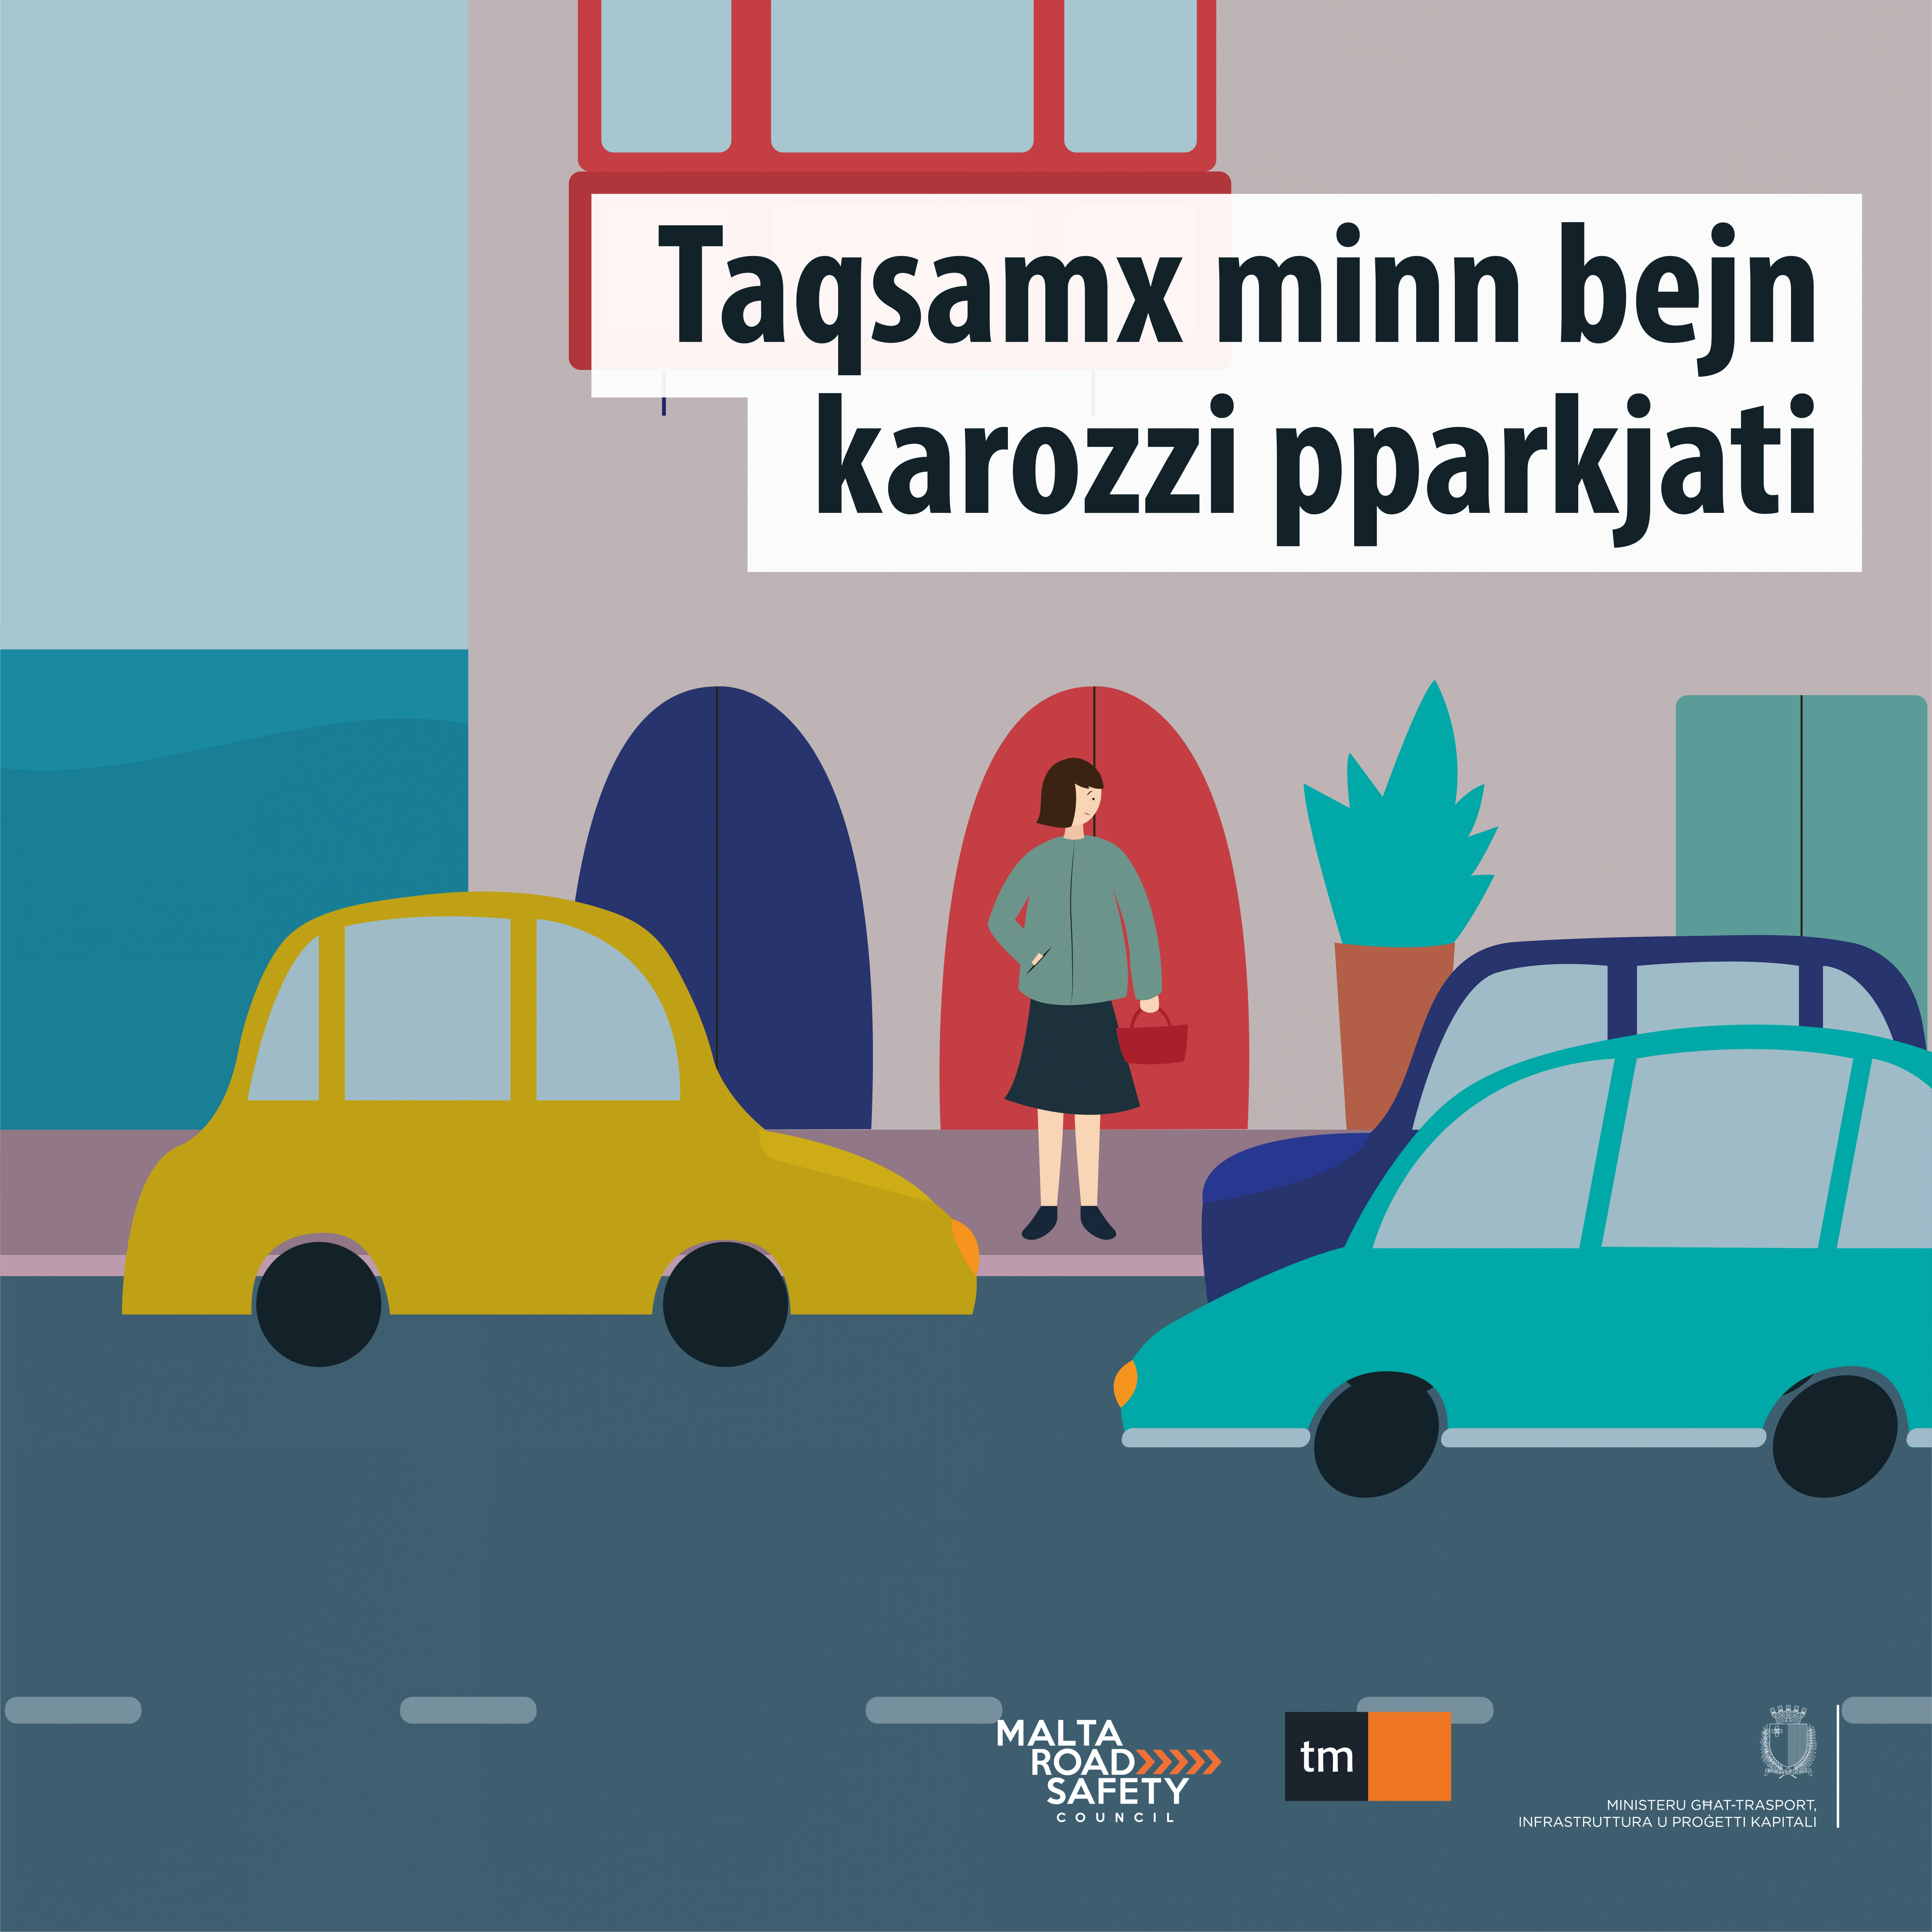 Avoid crossing between parked cars.